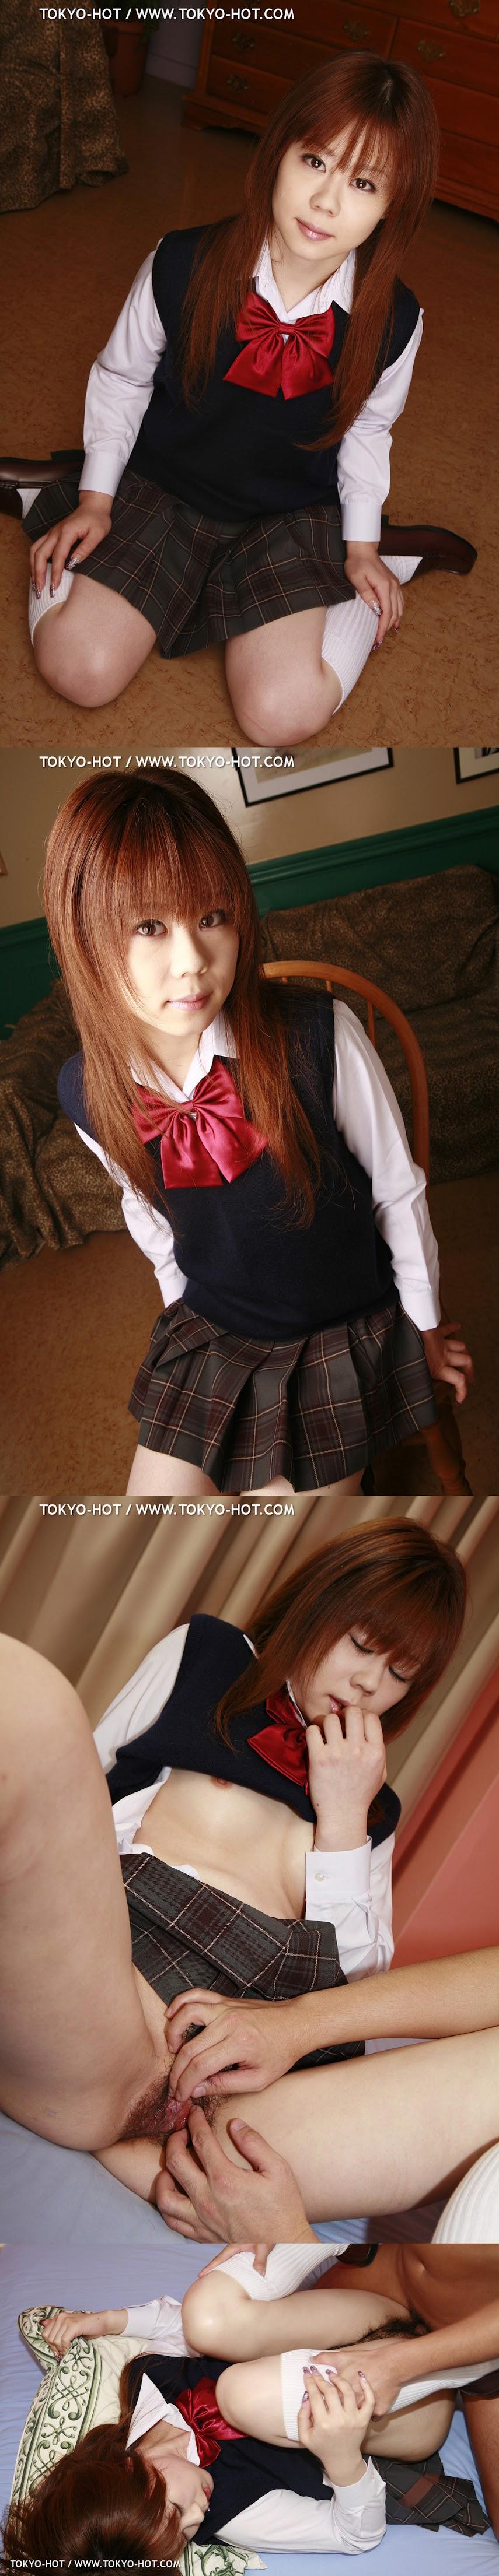 Tokyo-Hot e131miki horikita 002 sexy girls image jav